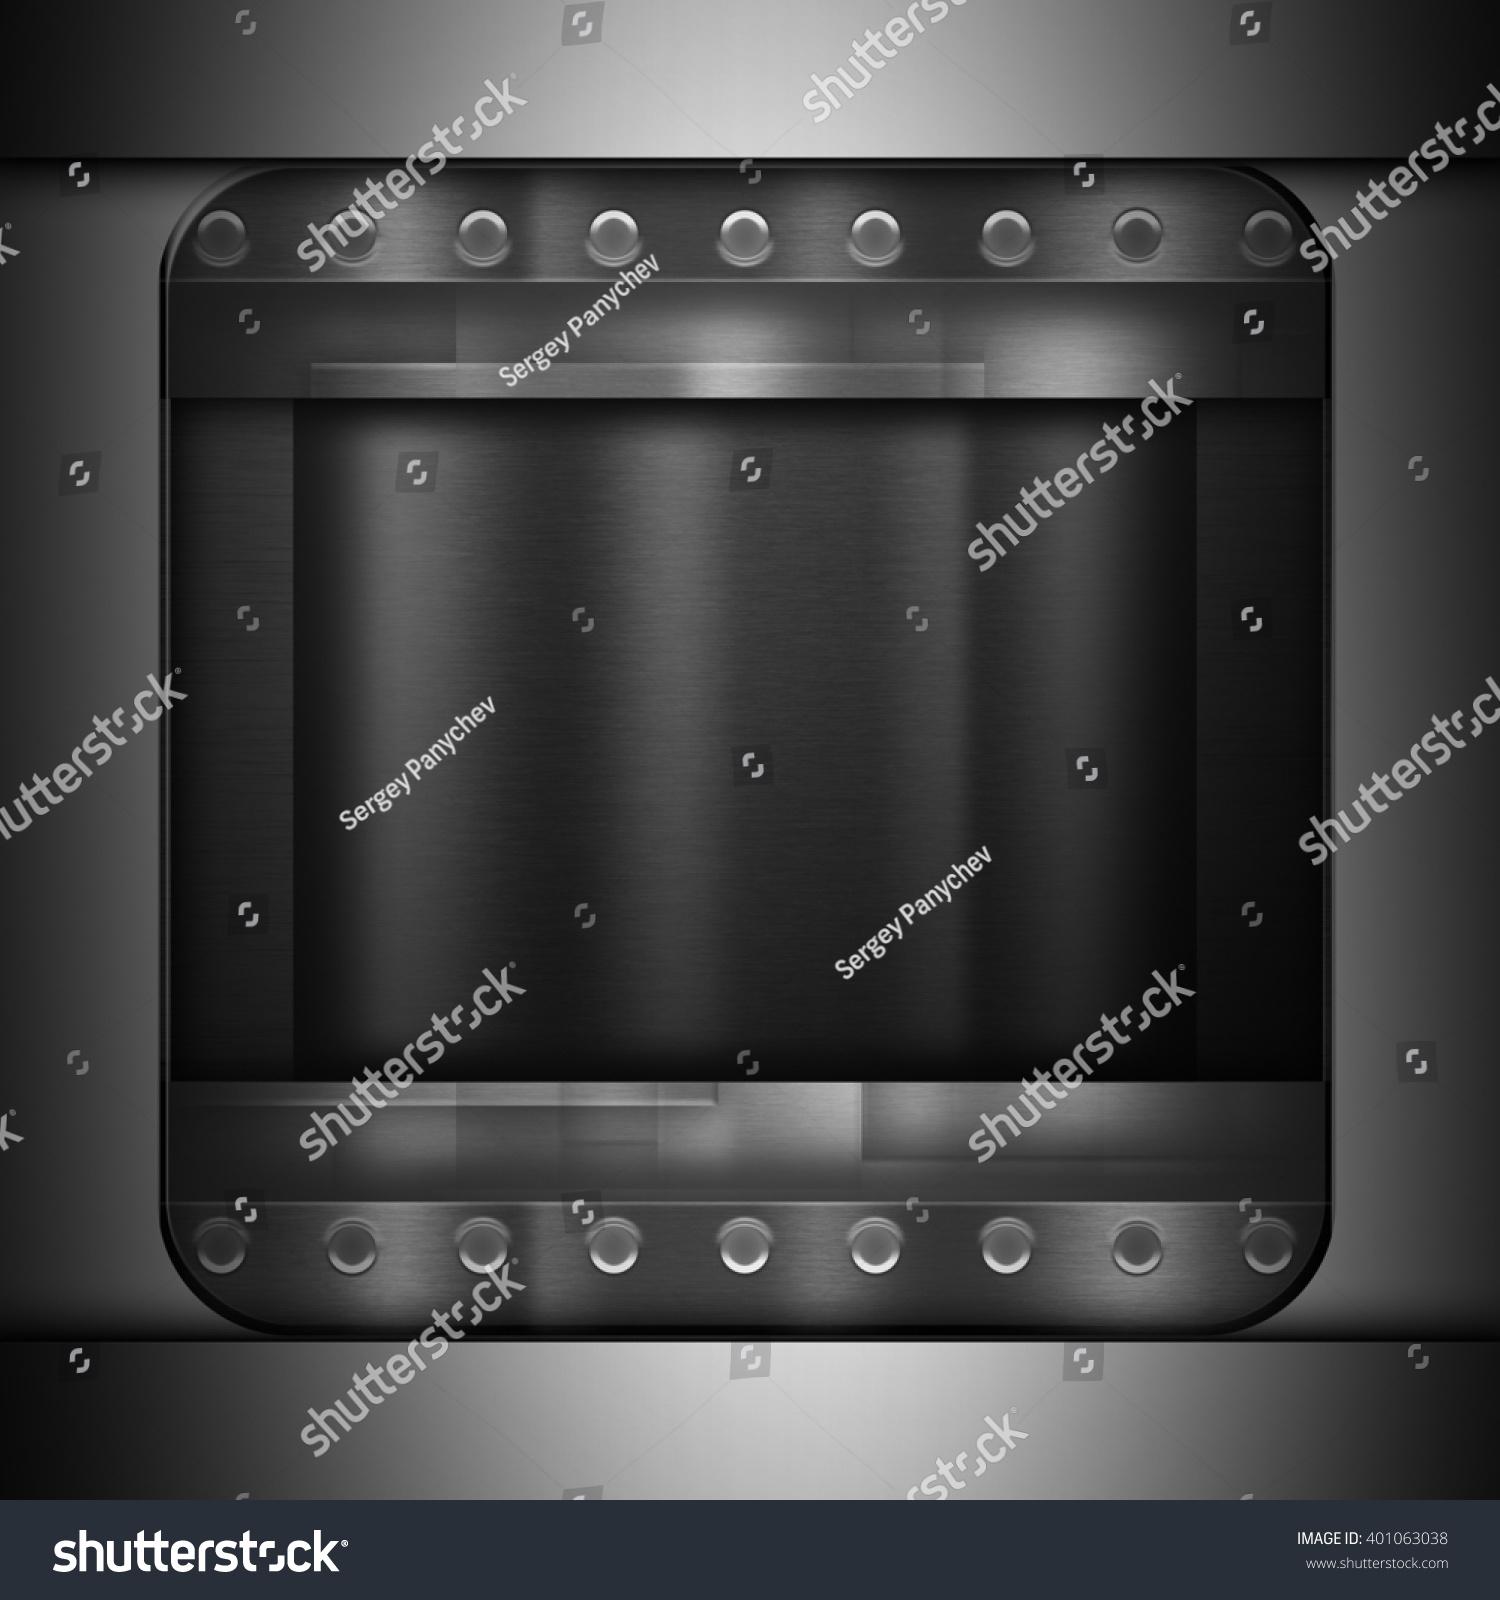 dark metal brushed texture background template stock illustration